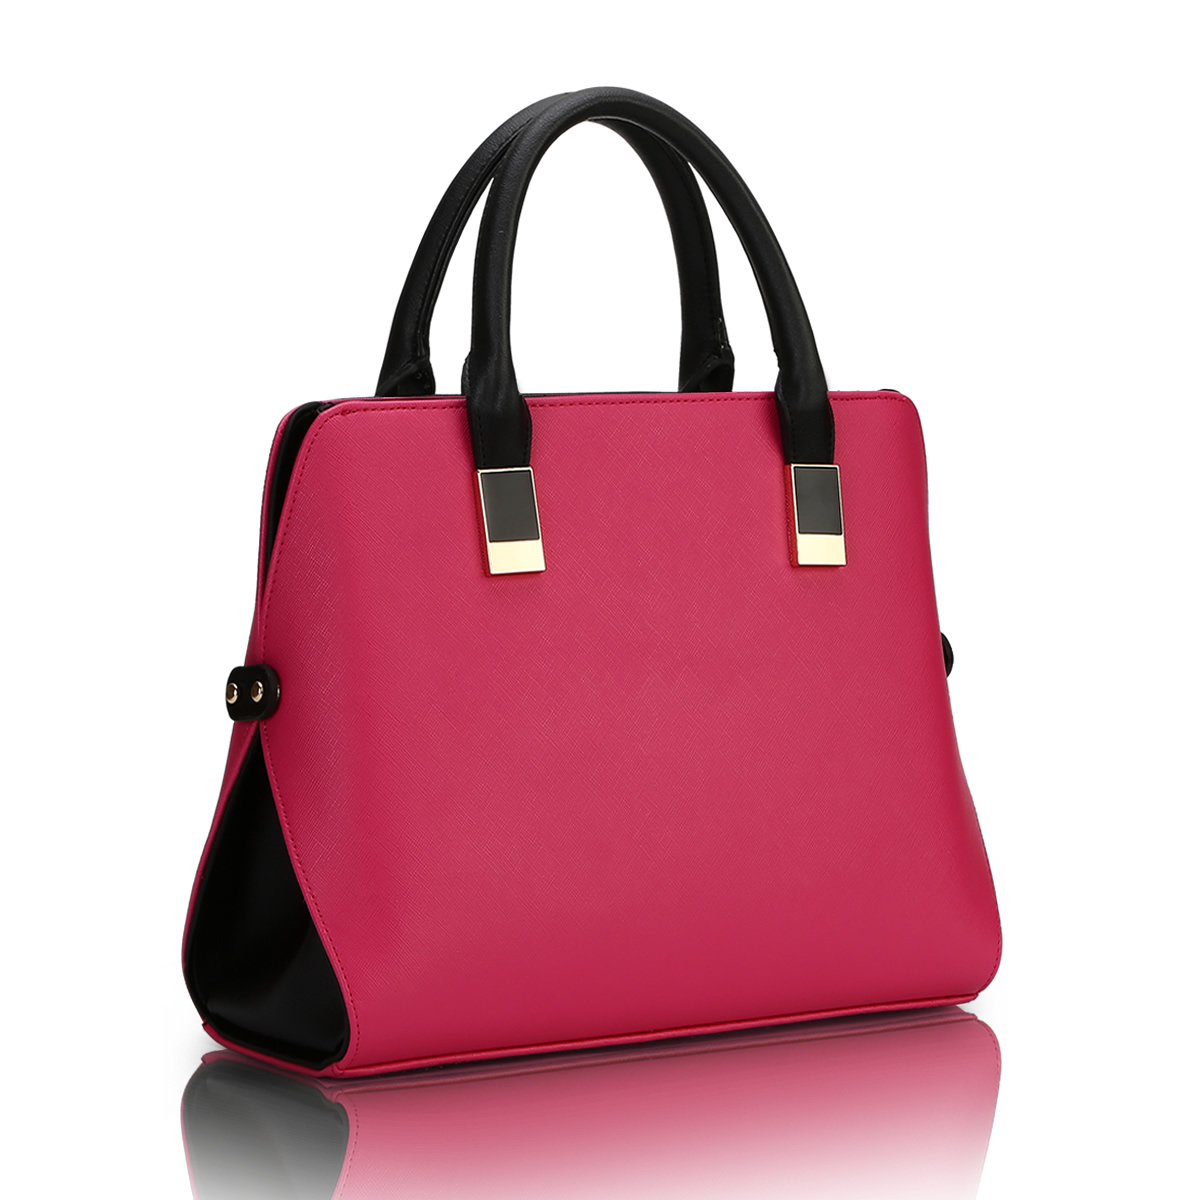 New shell casual high quality font b handbag b font brief women business shoulder bags cross